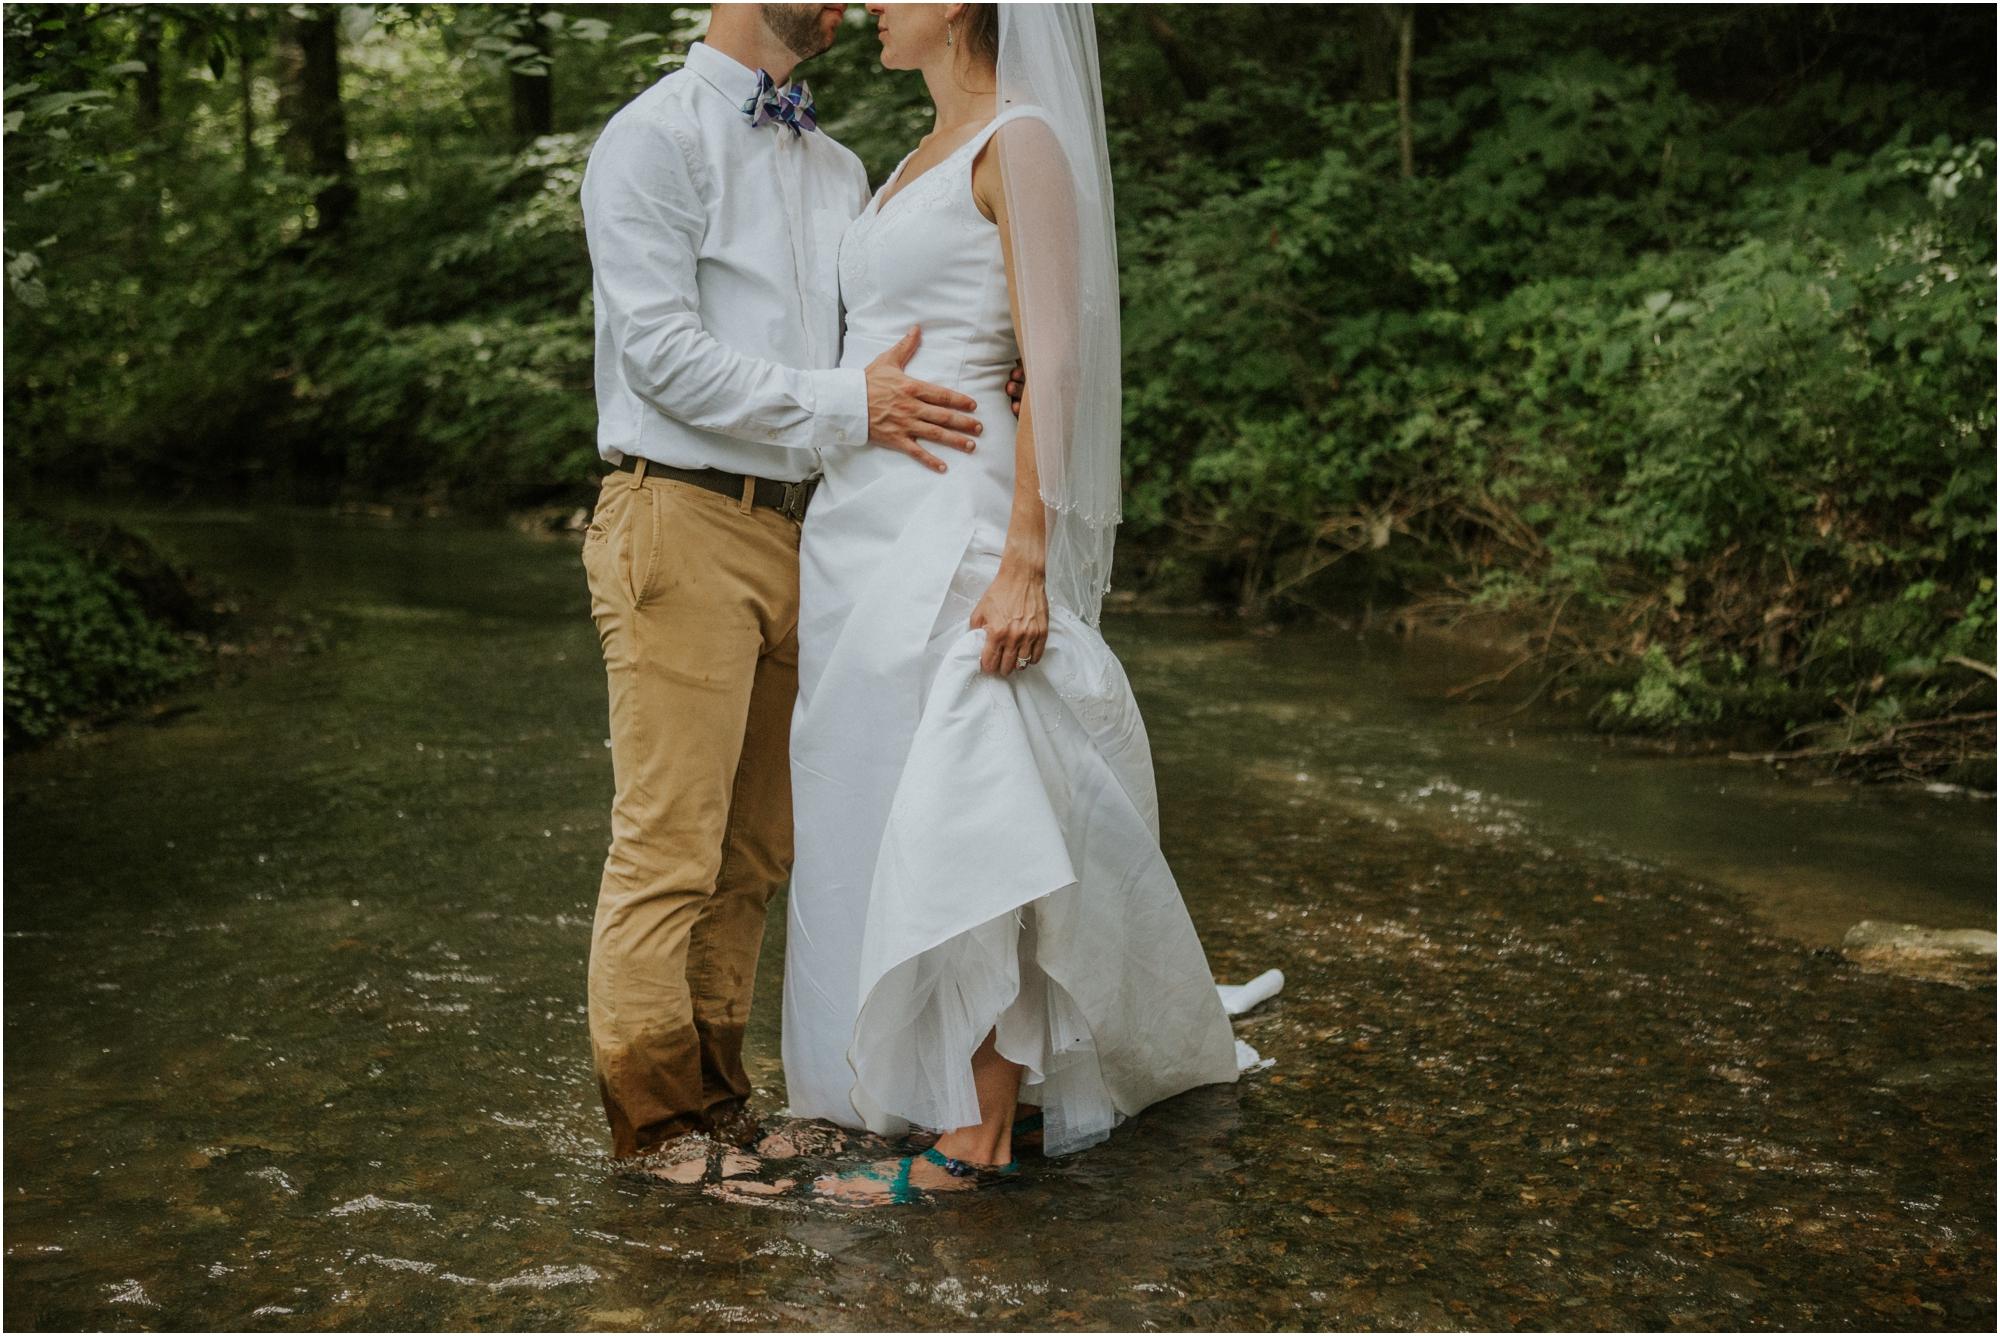 sugar-hollow-park-bristol-virginia-wedding-intimate-woodsy-black-forest-ceremony-adventurous-couple_0090.jpg